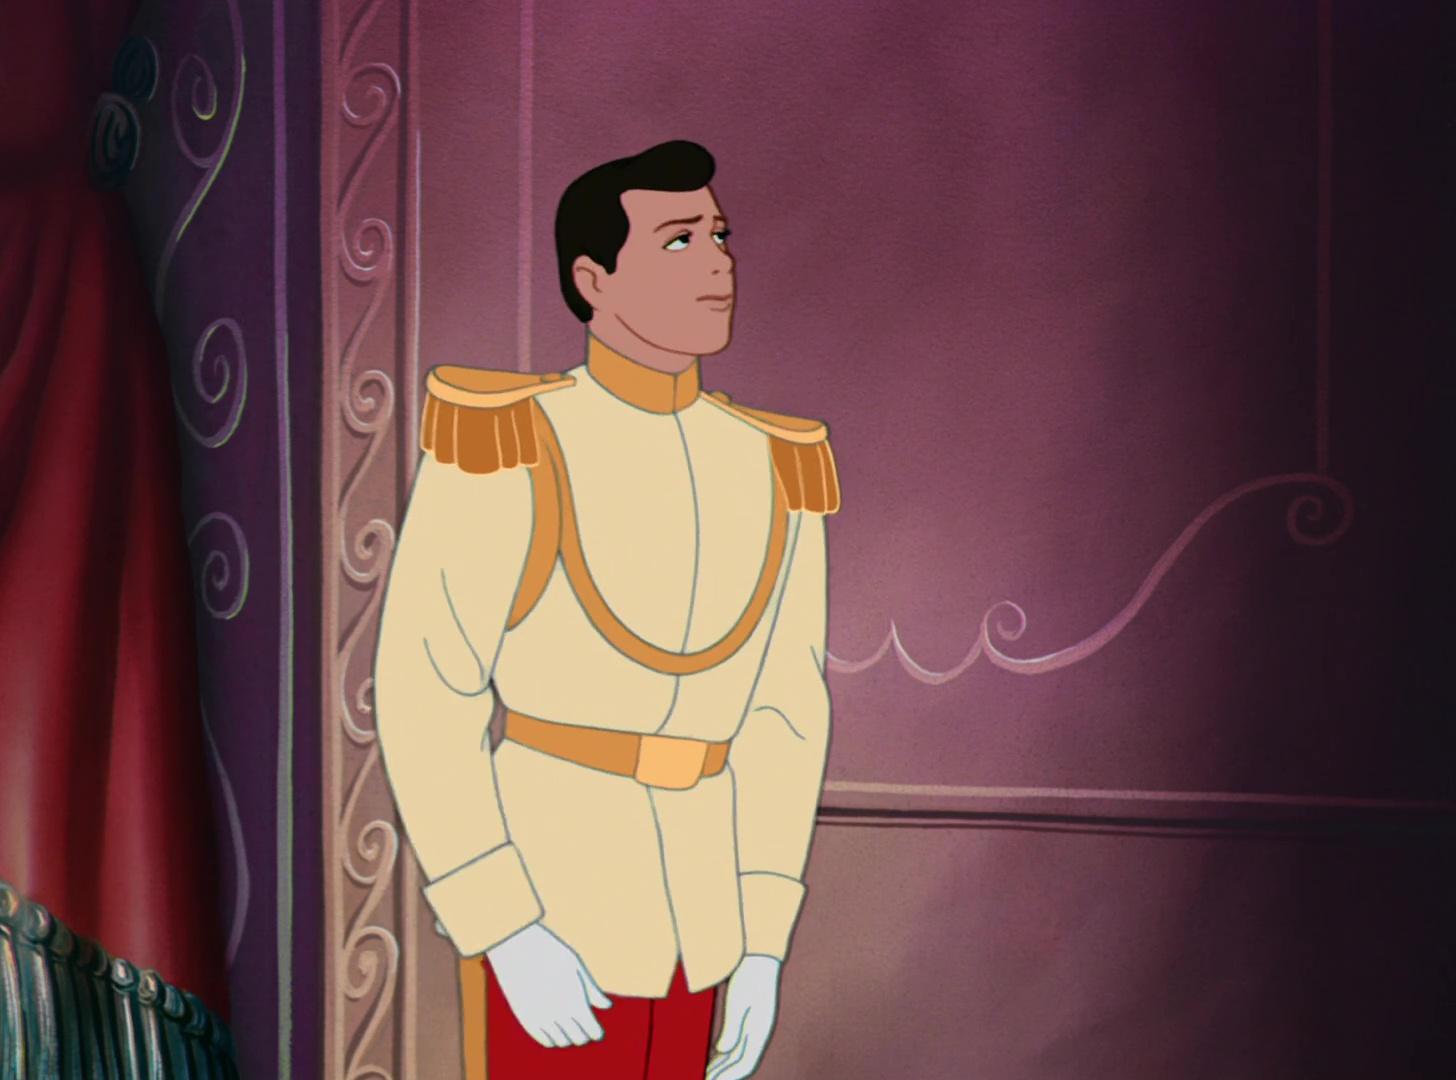 le prince charmant personnage dans cendrillon disney planet. Black Bedroom Furniture Sets. Home Design Ideas